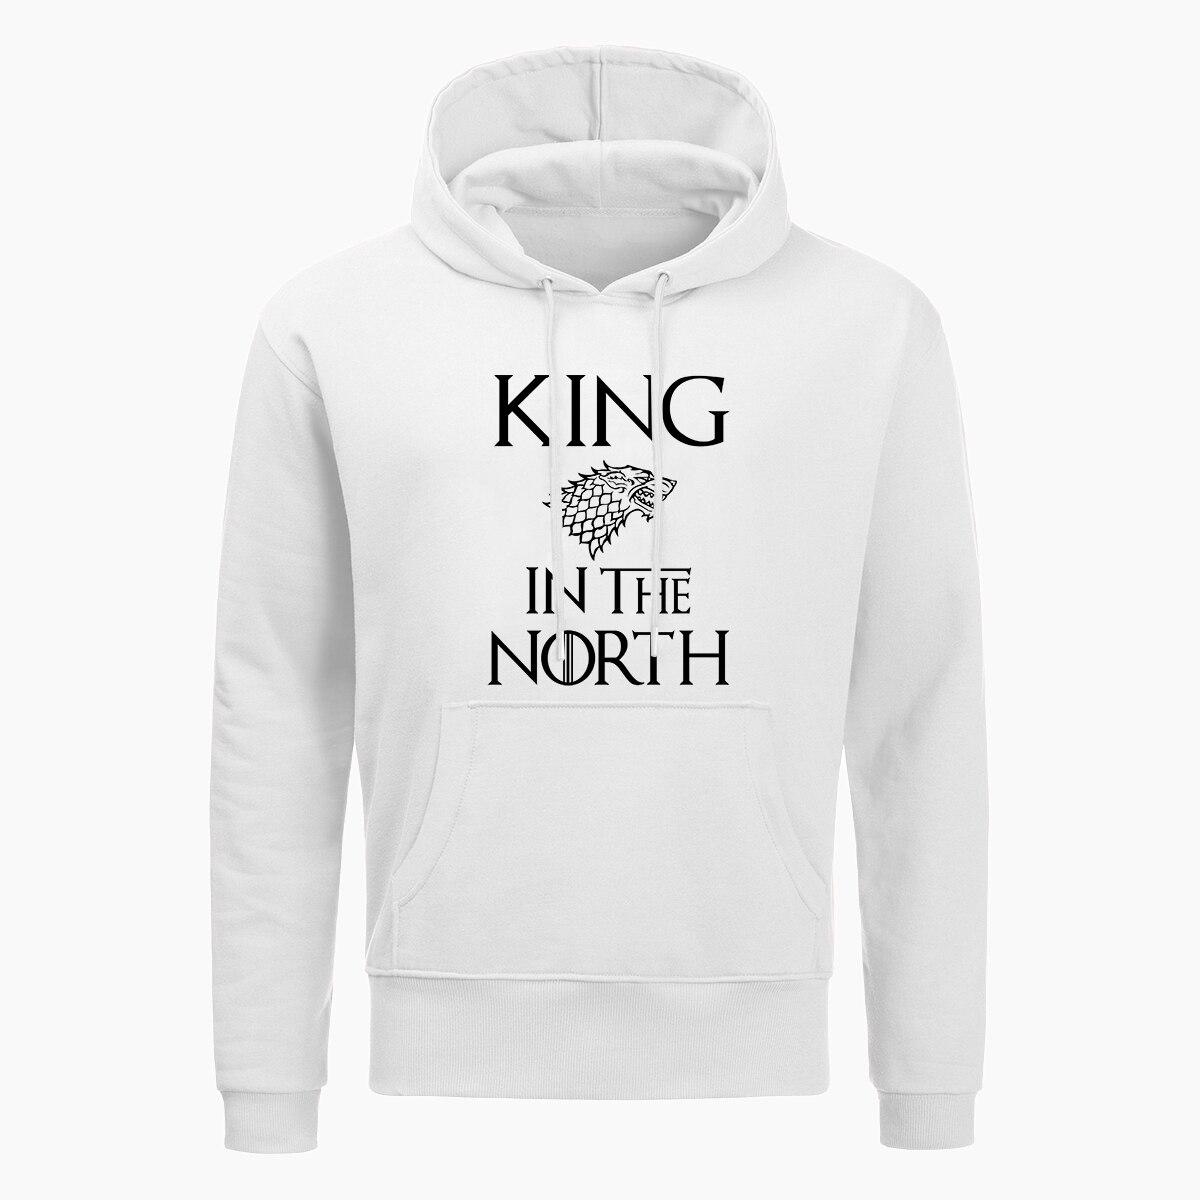 Brand 2019 King In The North Stark Game Of Thrones Mens Sweatshirt Funny Hip Hop Hoodies New Men 39 s Pullover Sweatshirts in Hoodies amp Sweatshirts from Men 39 s Clothing